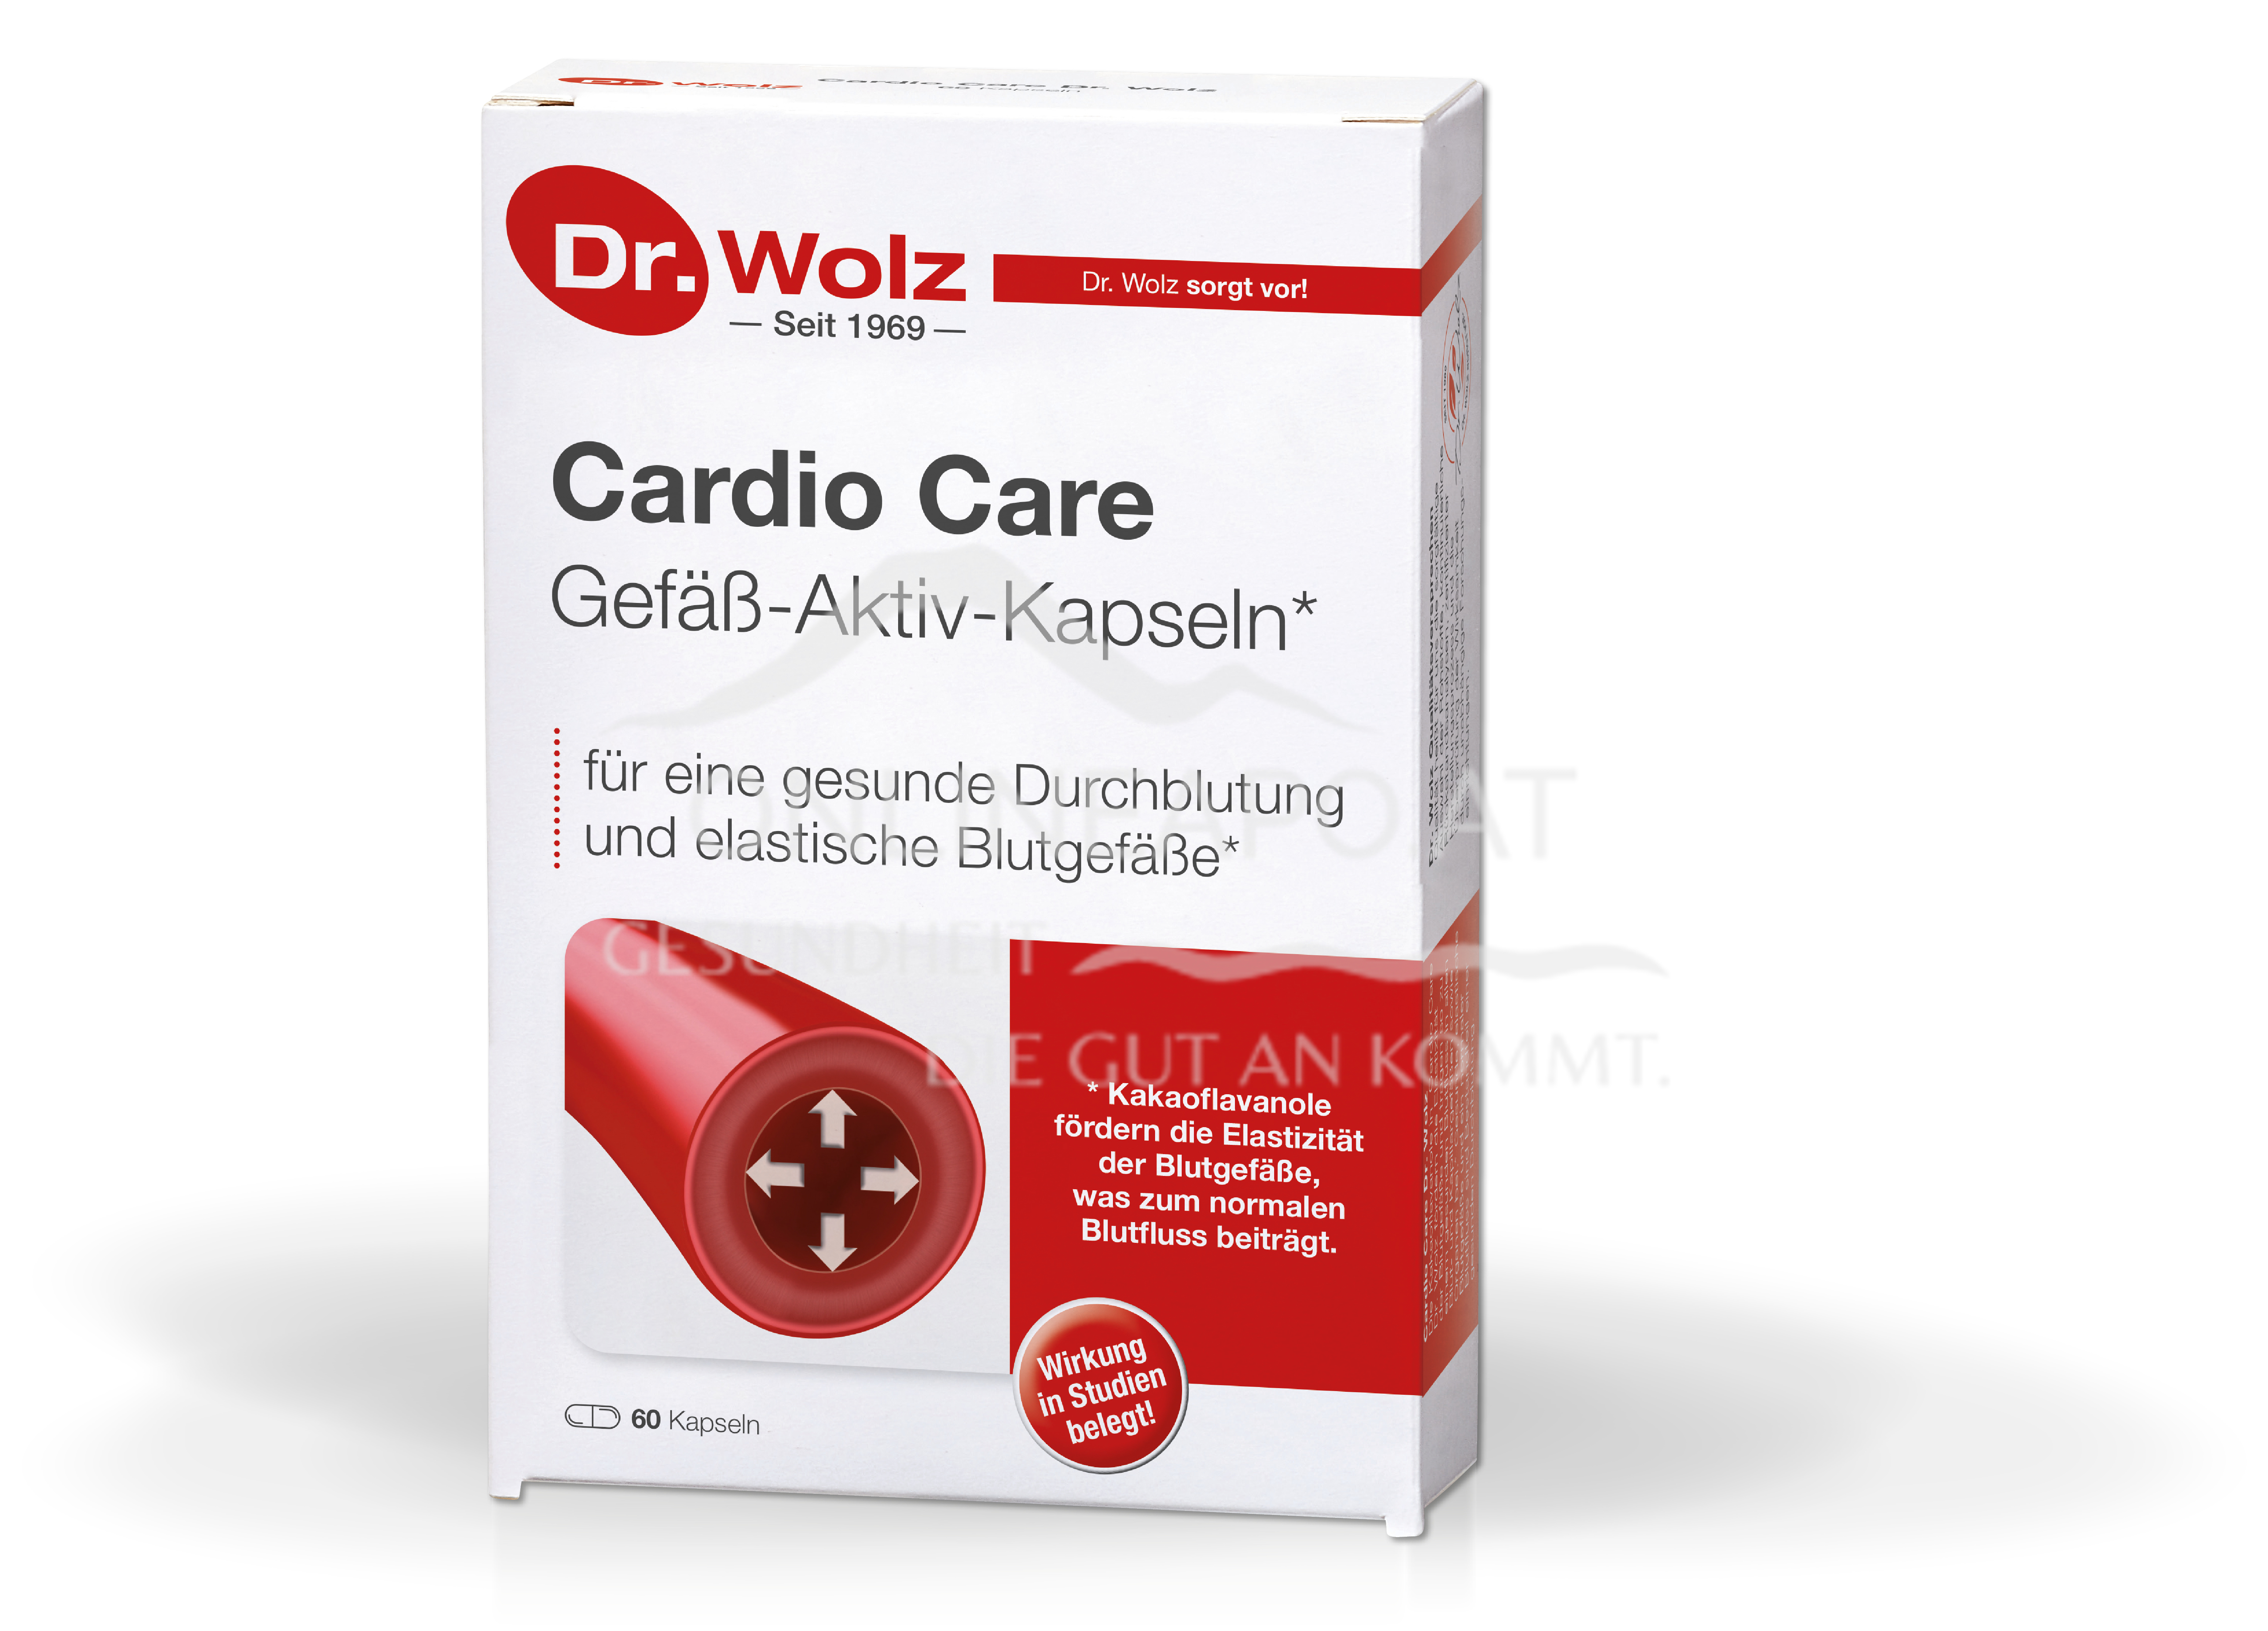 Dr. Wolz Cardio Care Kapseln